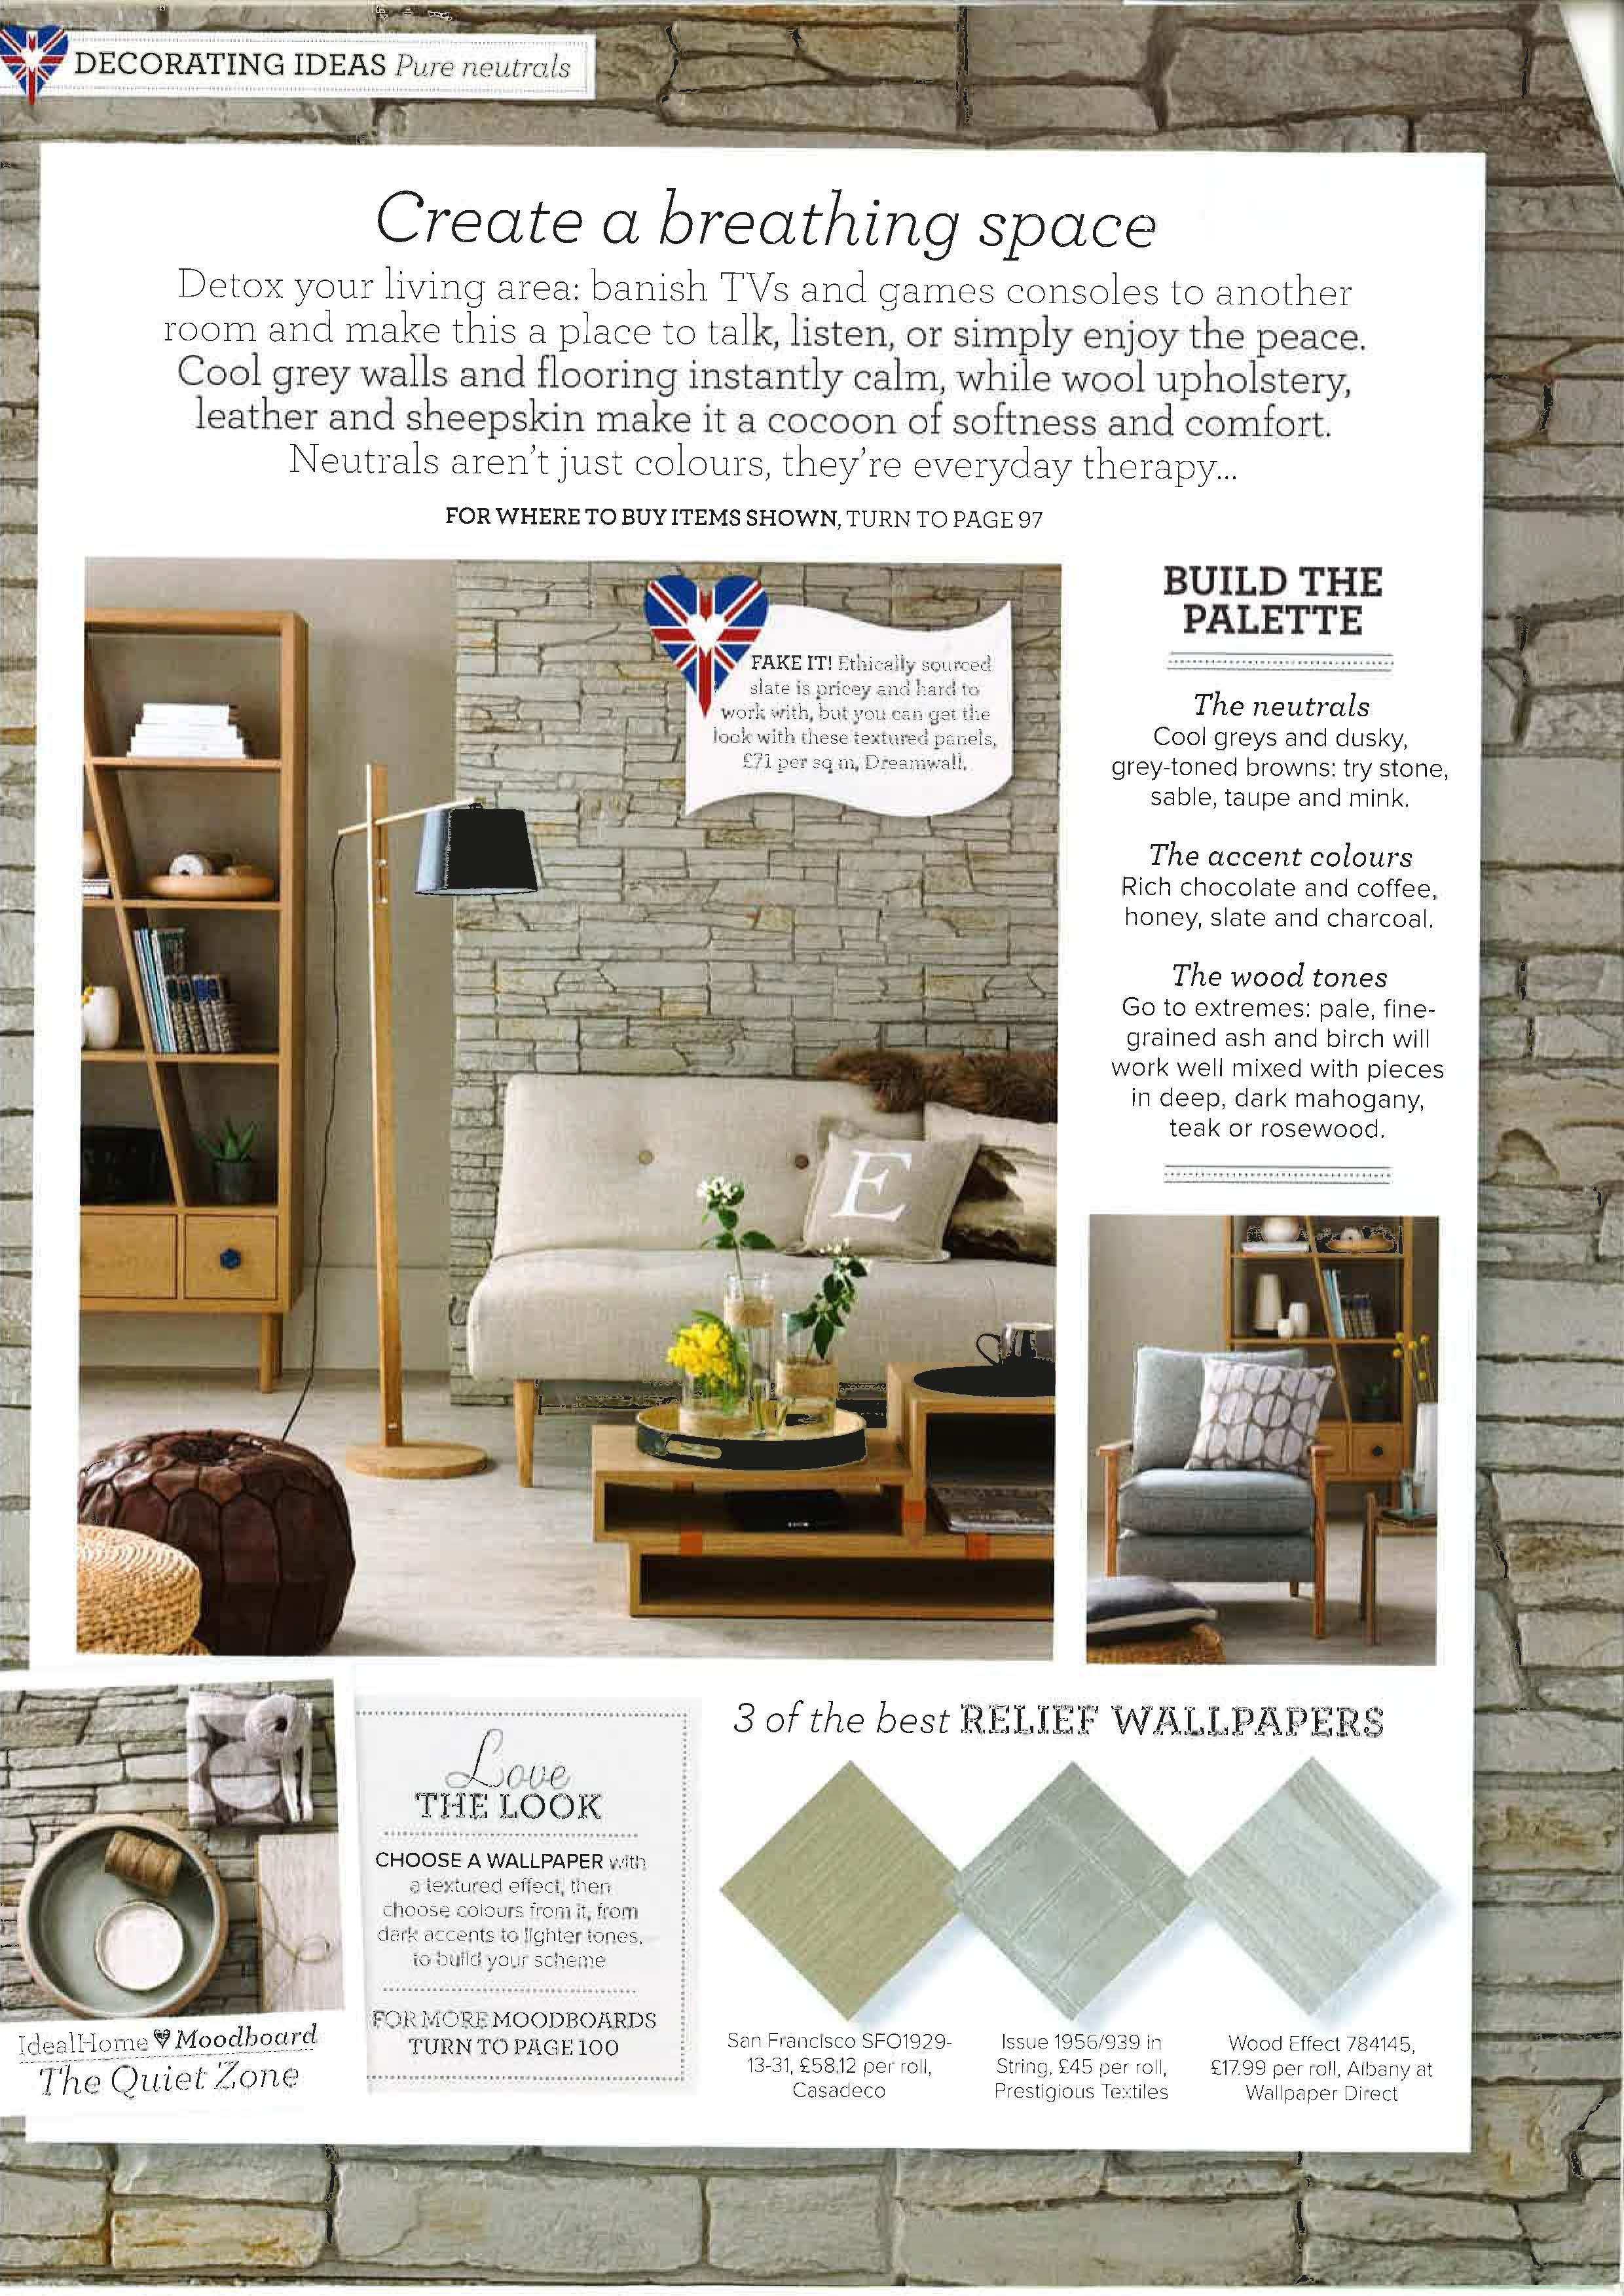 Ideal Home - Knap sofa bed | Decor | Pinterest